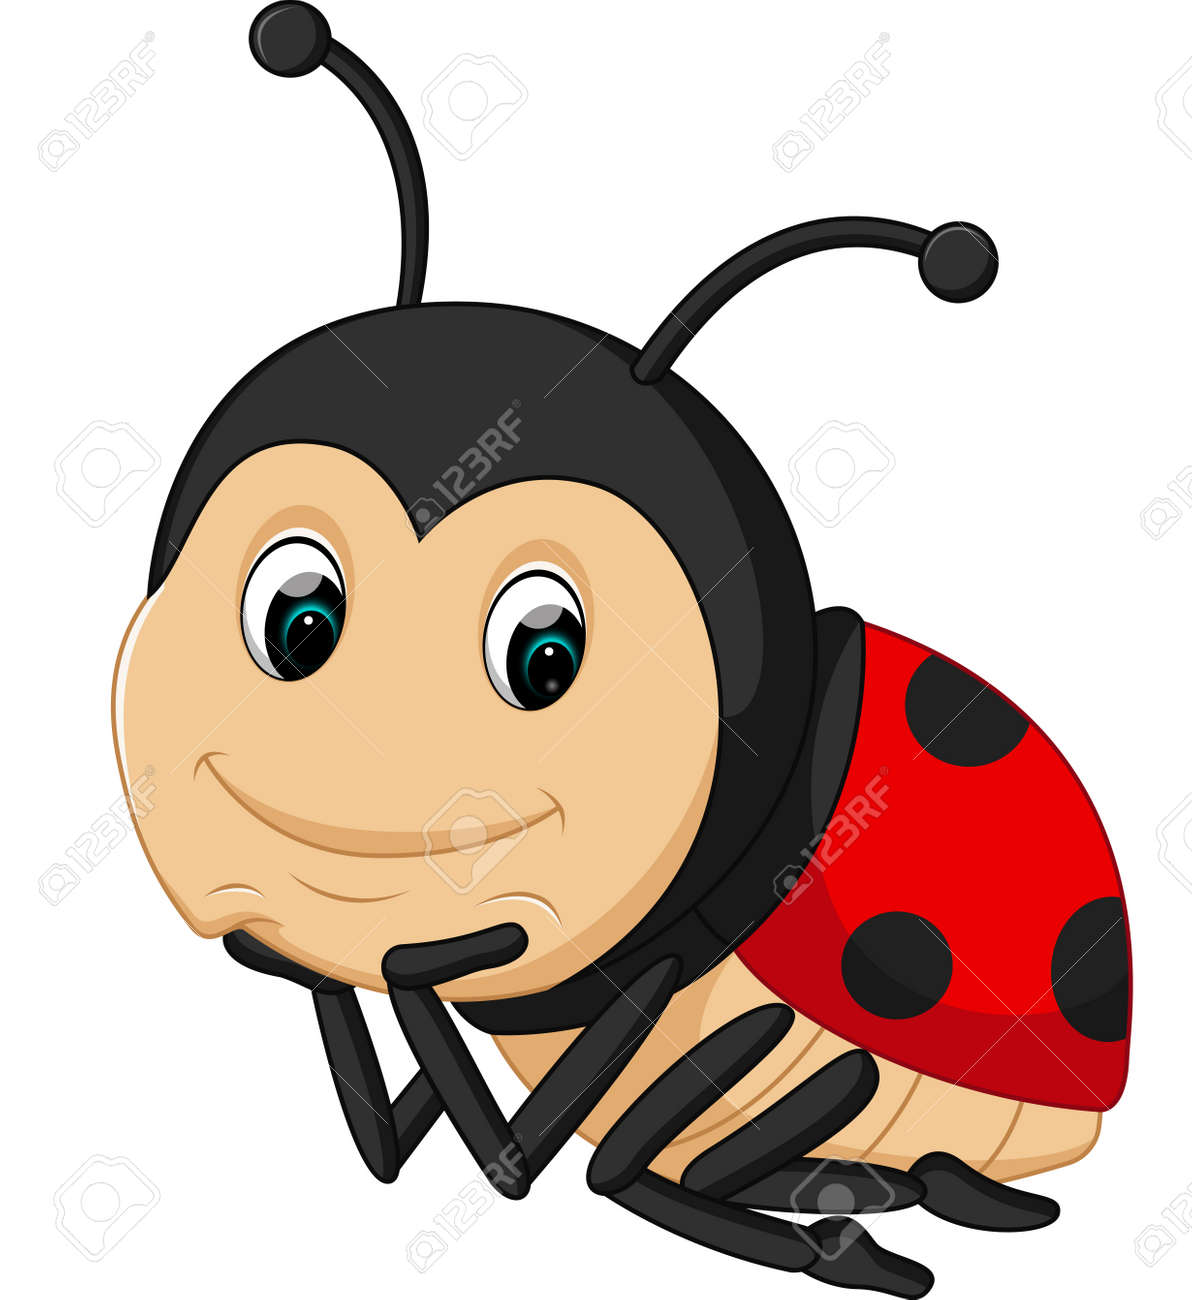 Cute Ladybug Cartoon Stock Vector   69154987